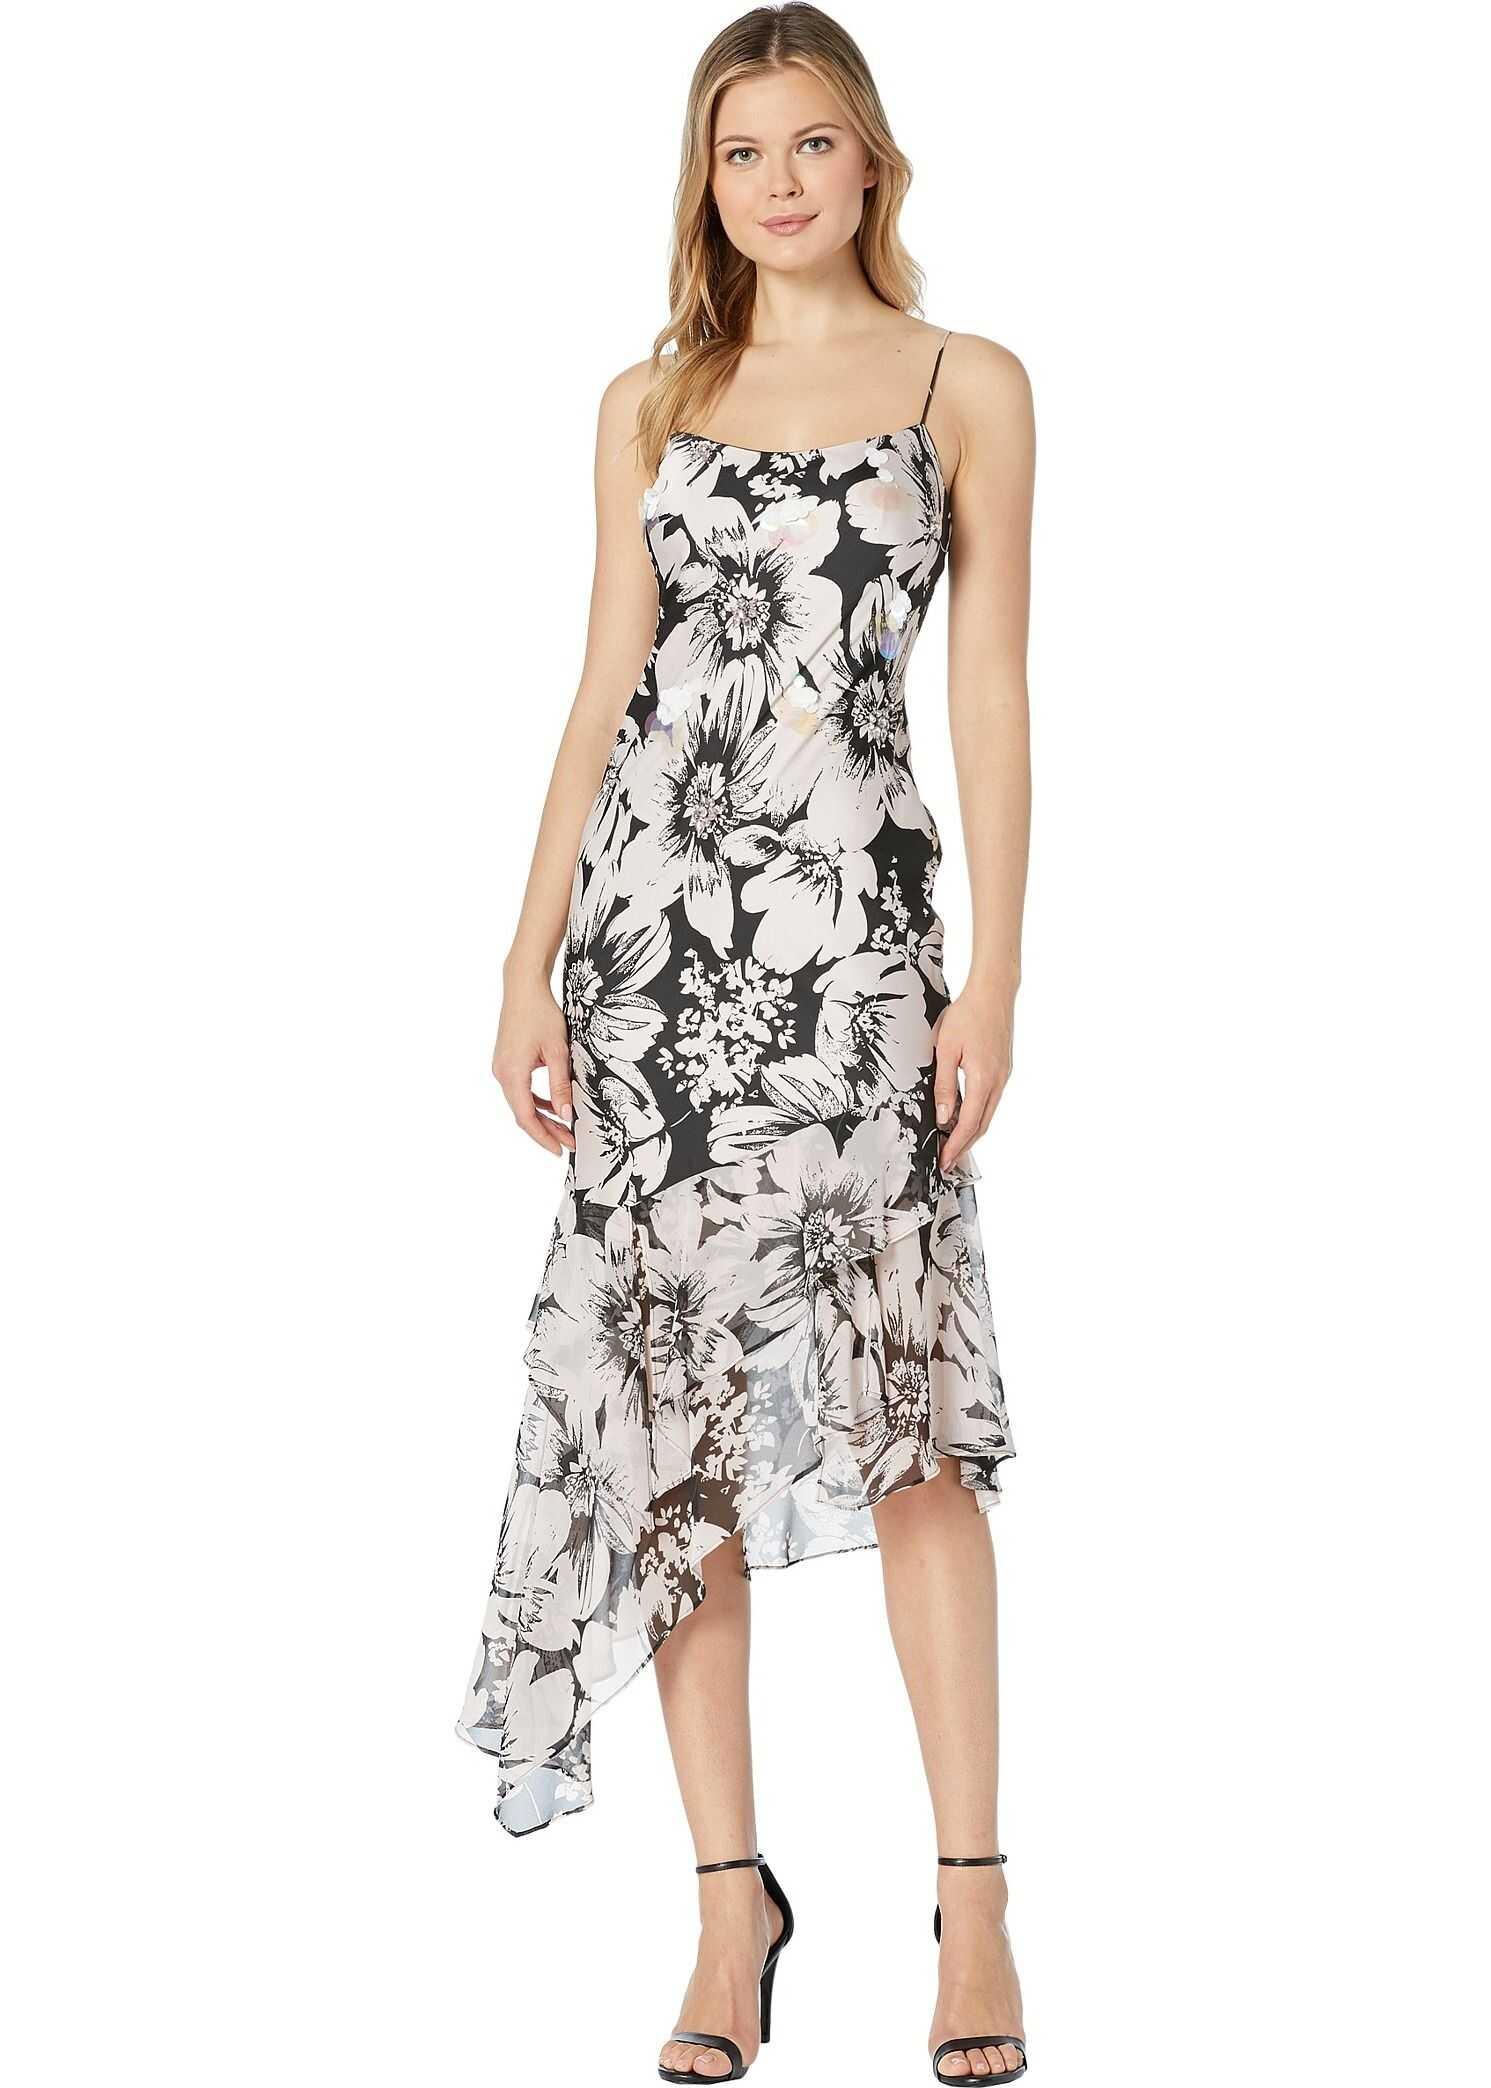 Adrianna Papell Bias Cut Floral Printed Chiffon Midi Dress Blush/Black